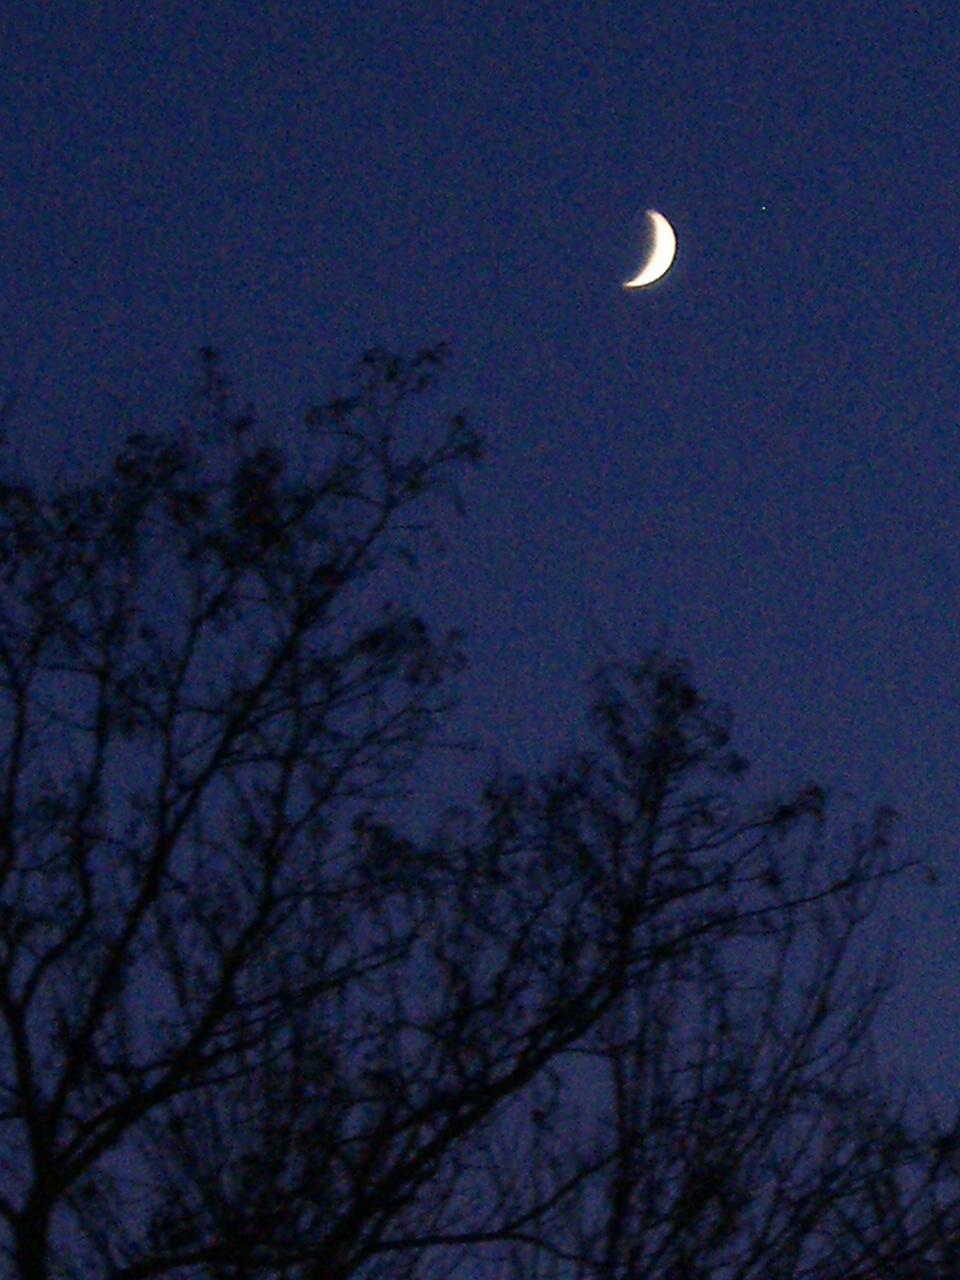 Moon predict weather lore  The Old Farmers Almanac